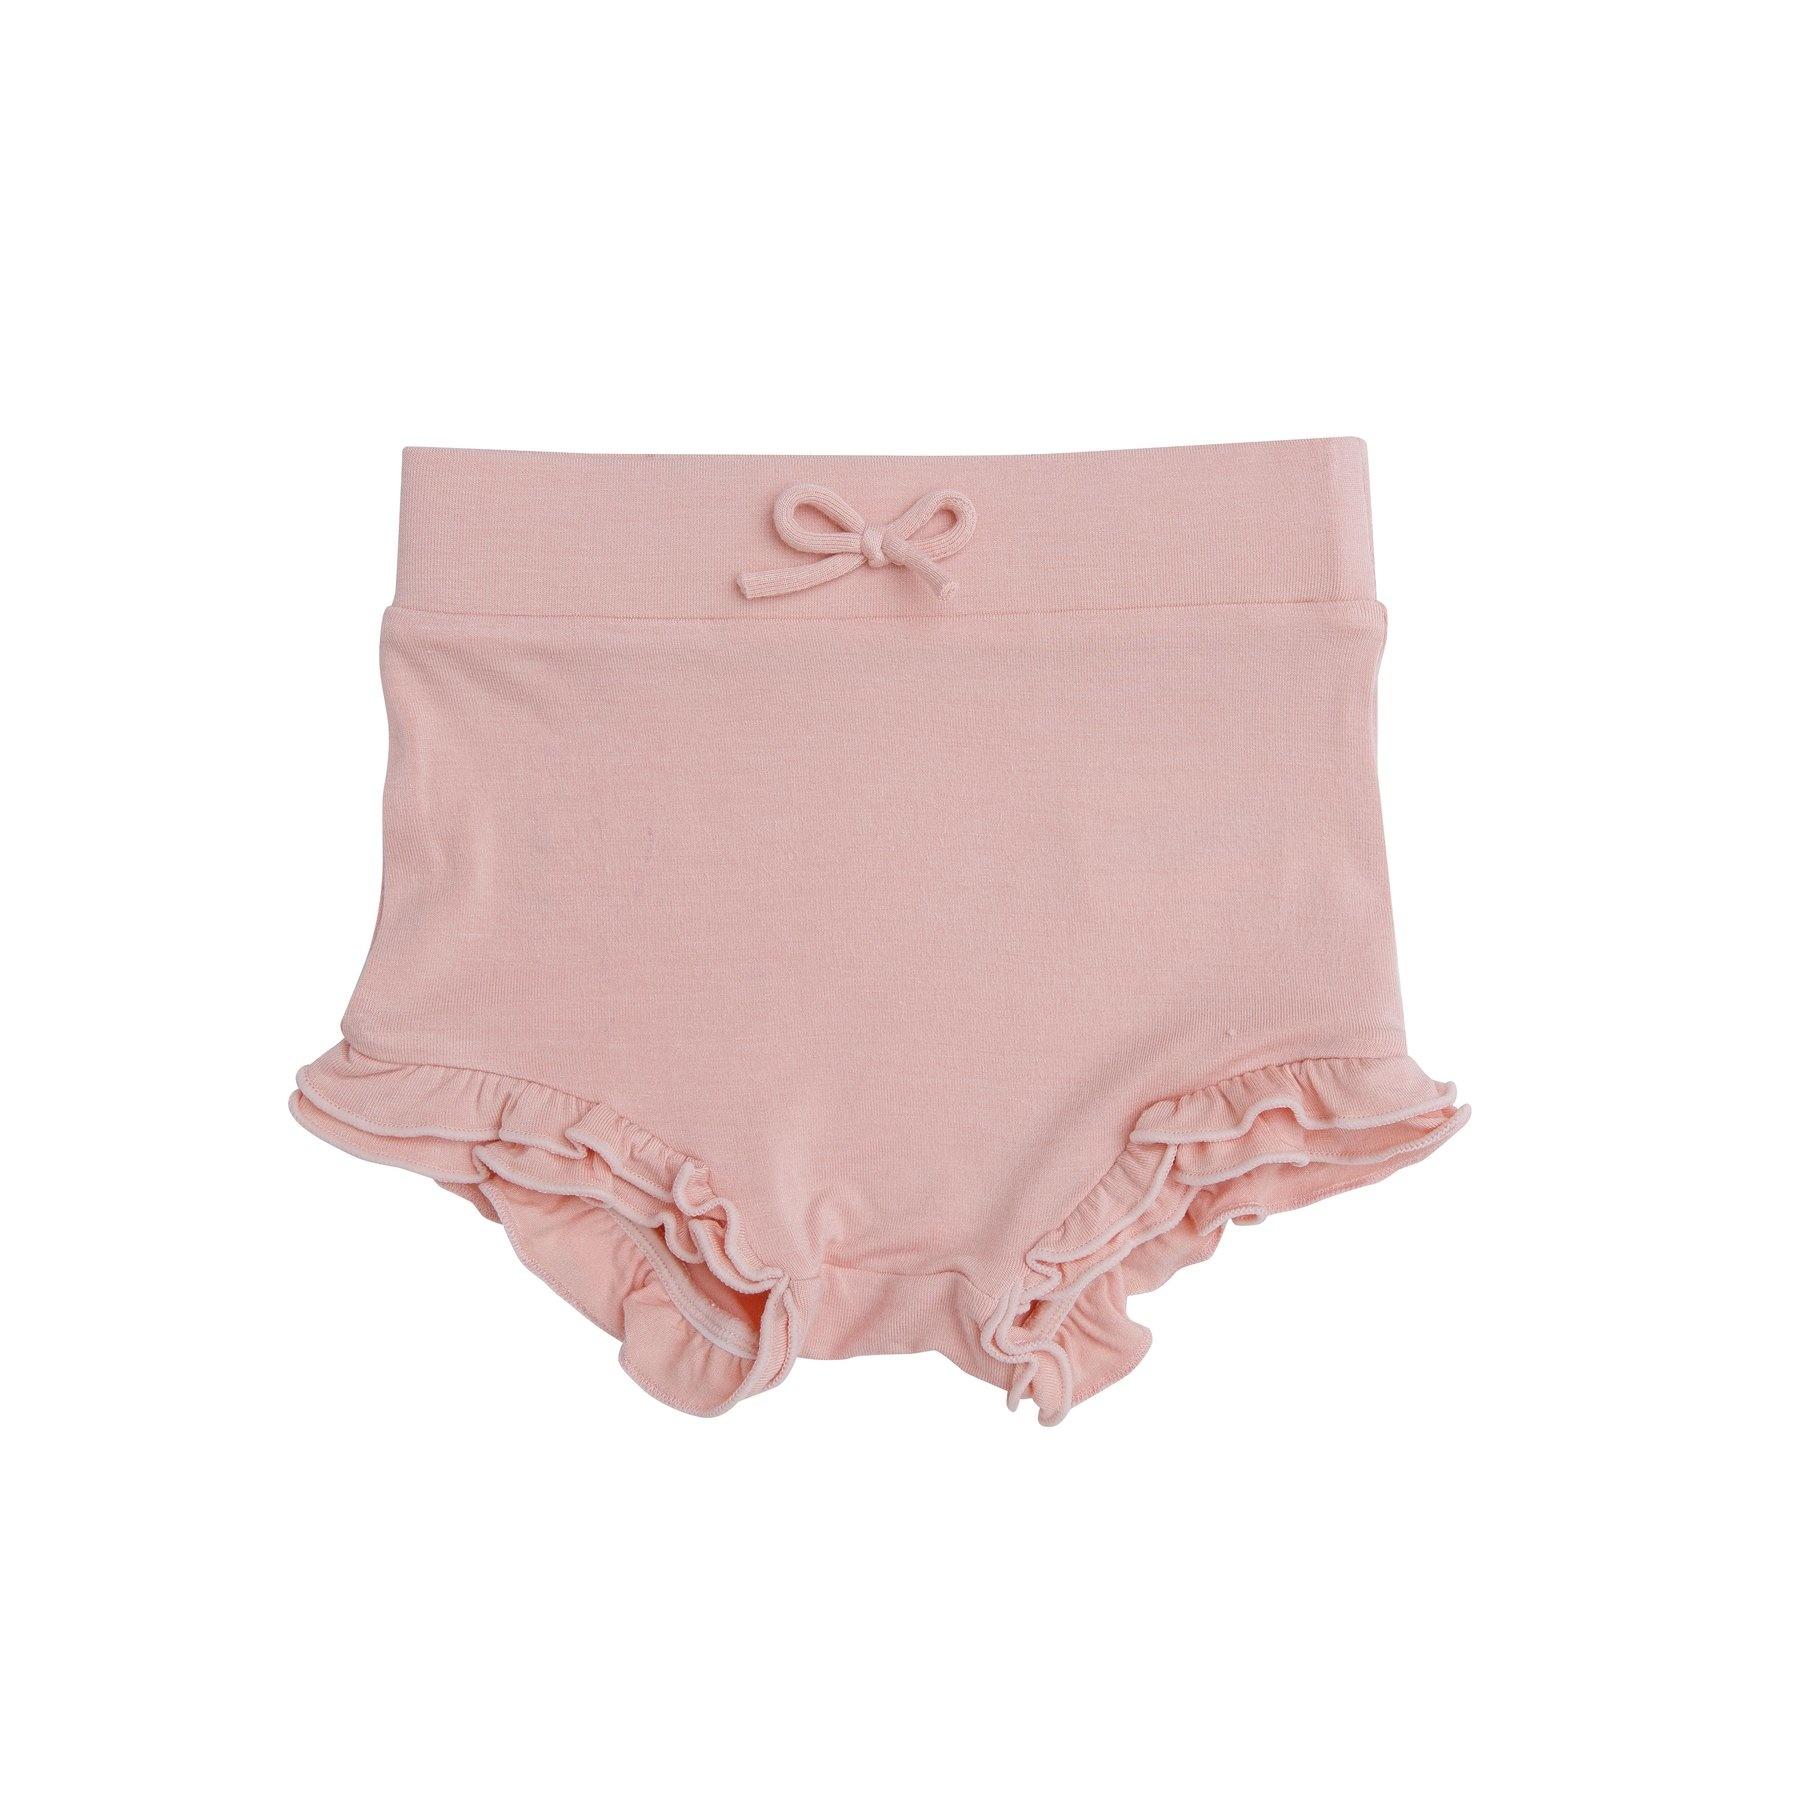 Angel Dear Modern Basics Bamboo High Waist Shorts - Dust Pale Pink